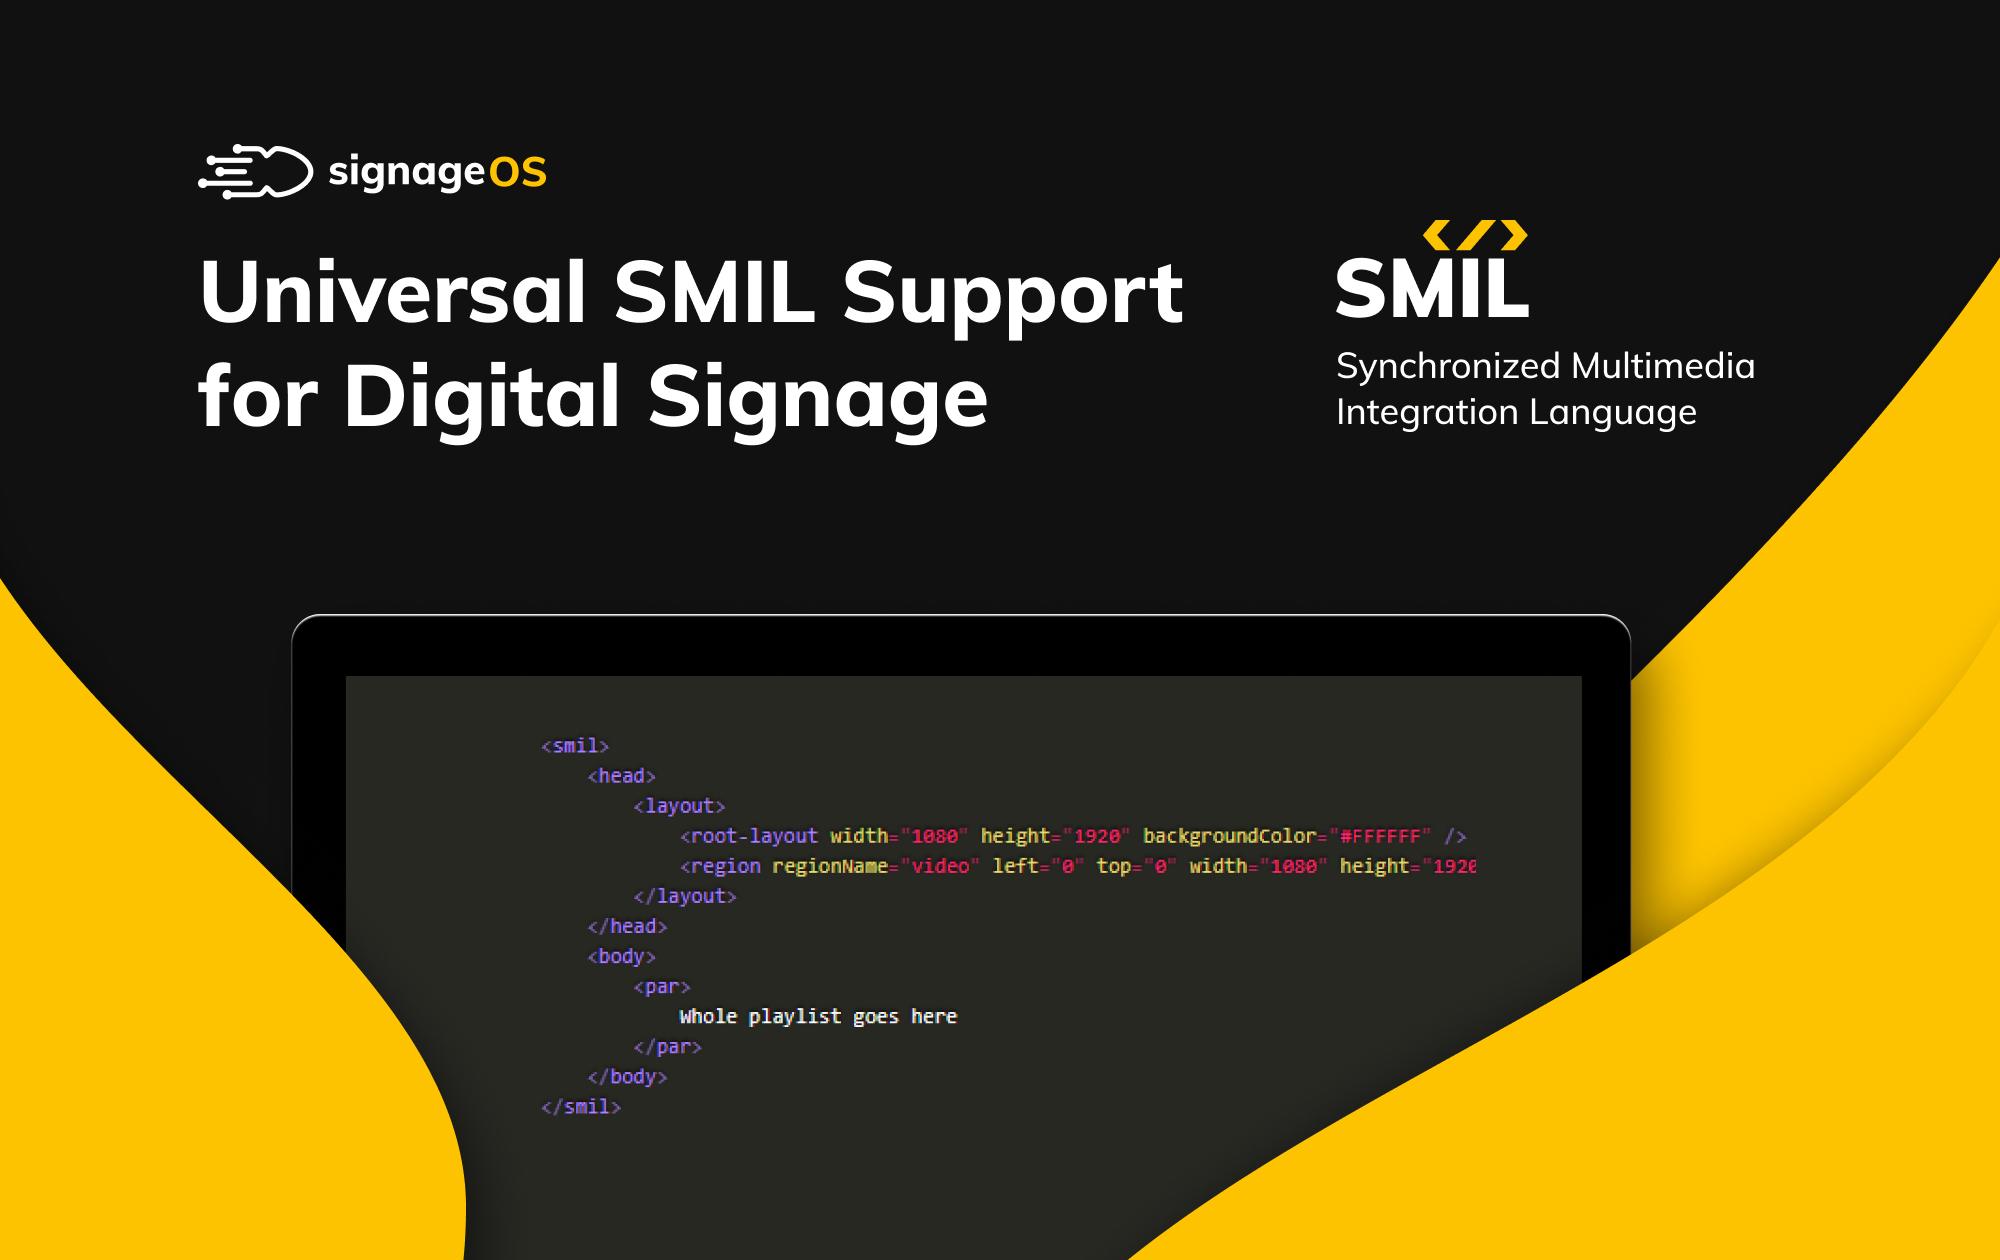 Universal SMIL Support For Digital Signage Hardware